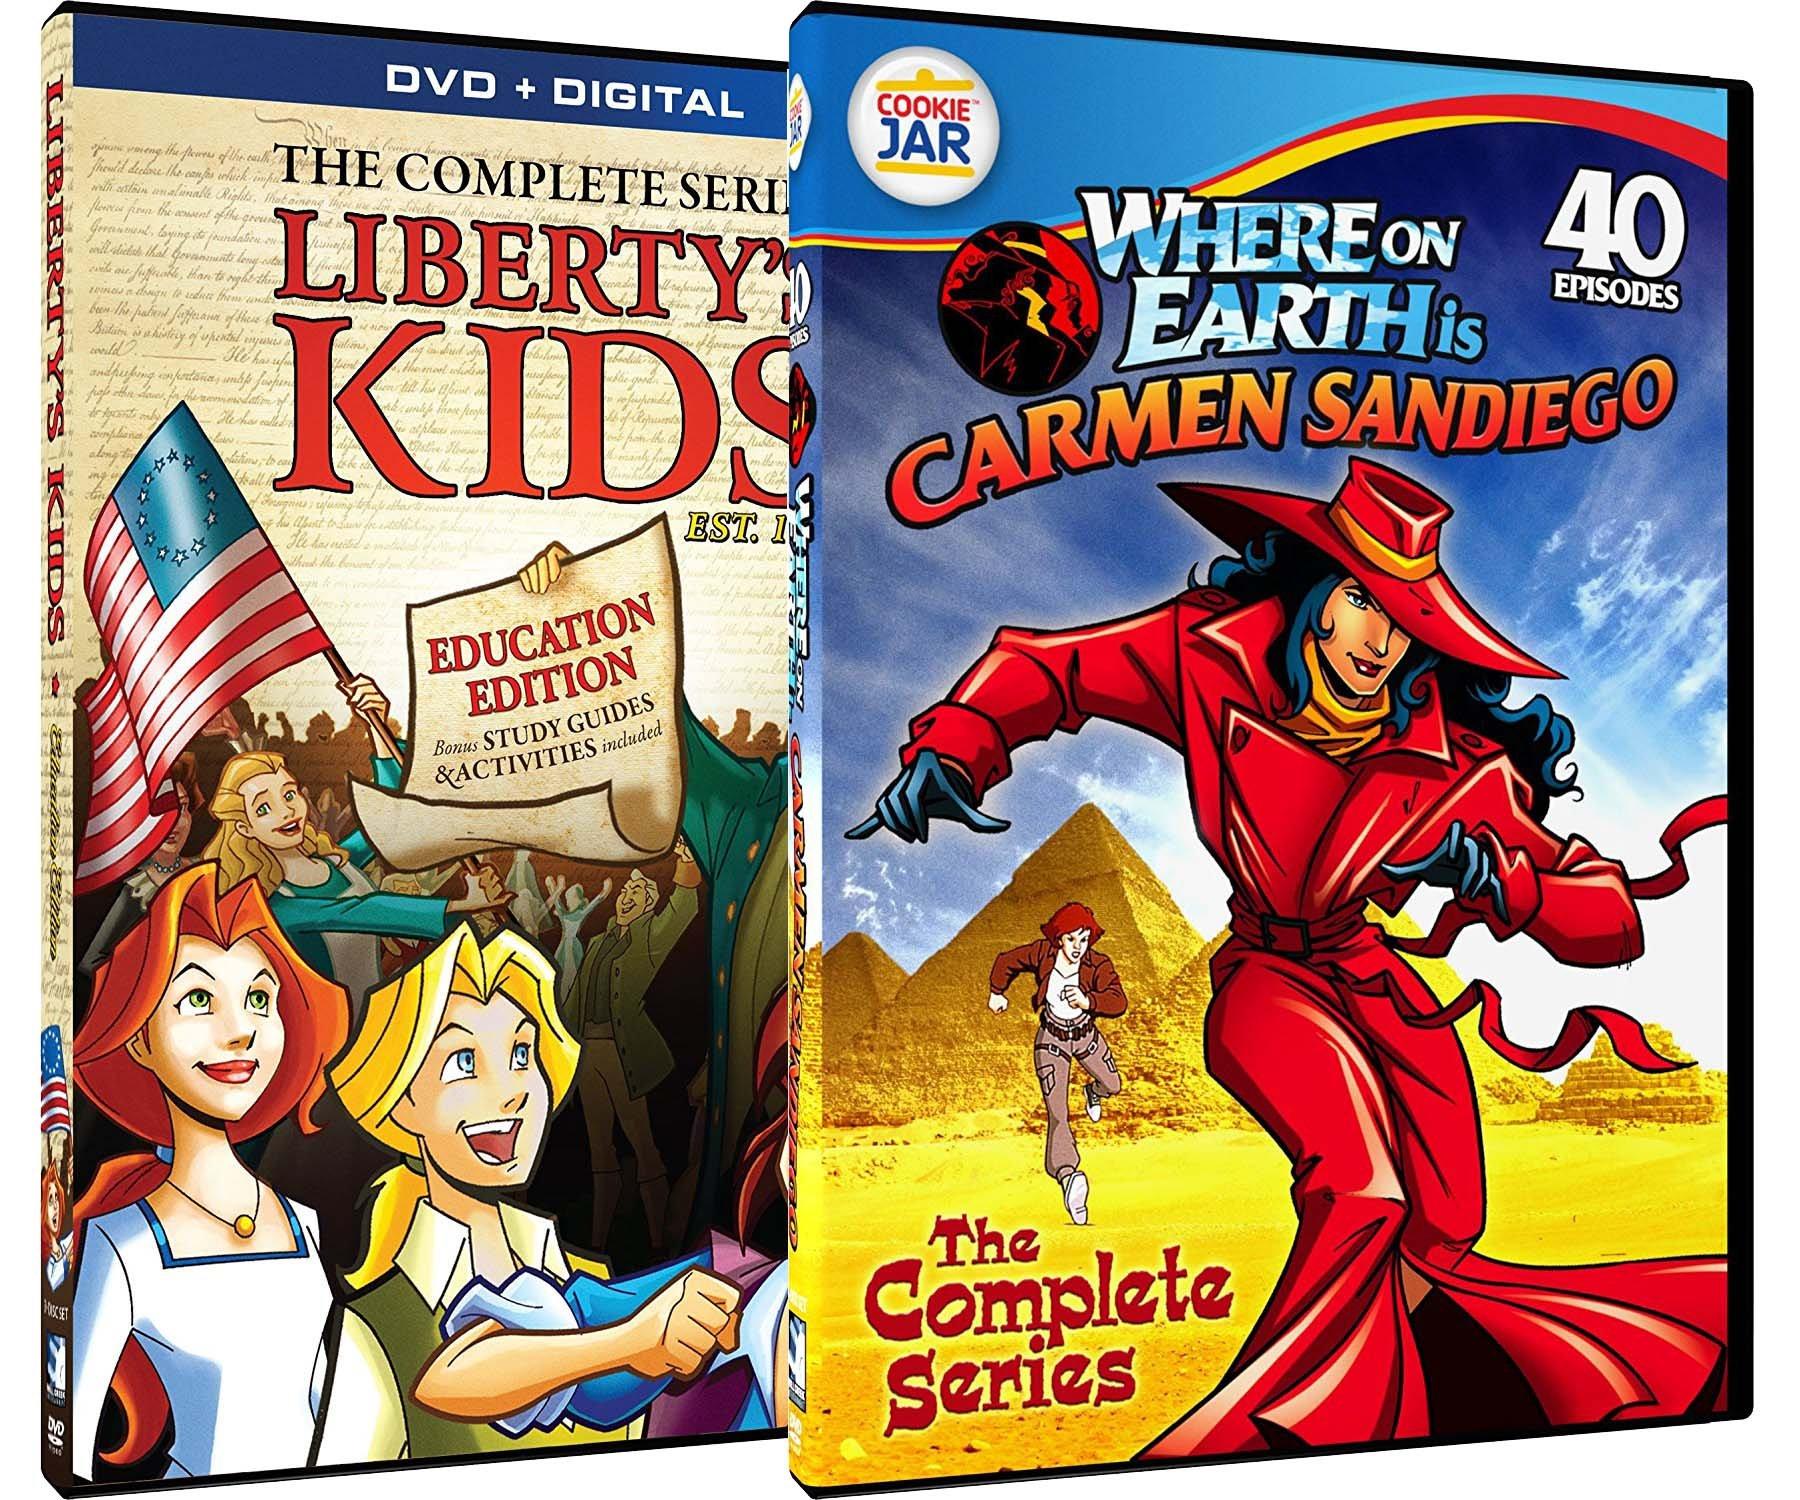 Liberty's Kids + Digital & Carmen Sandiego - Complete Series TV Bundle